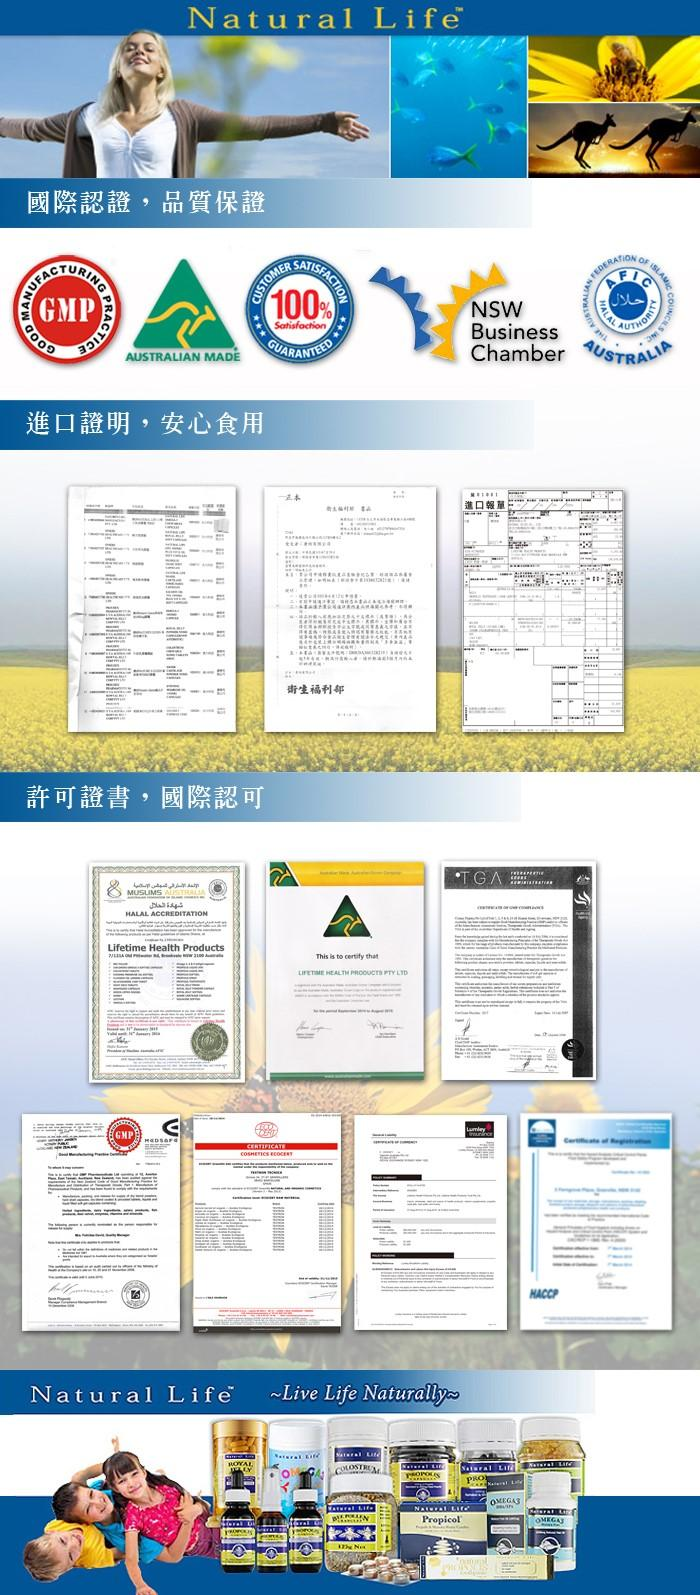 Natural Life-澳洲蜂膠牙膏(2入)產品資訊